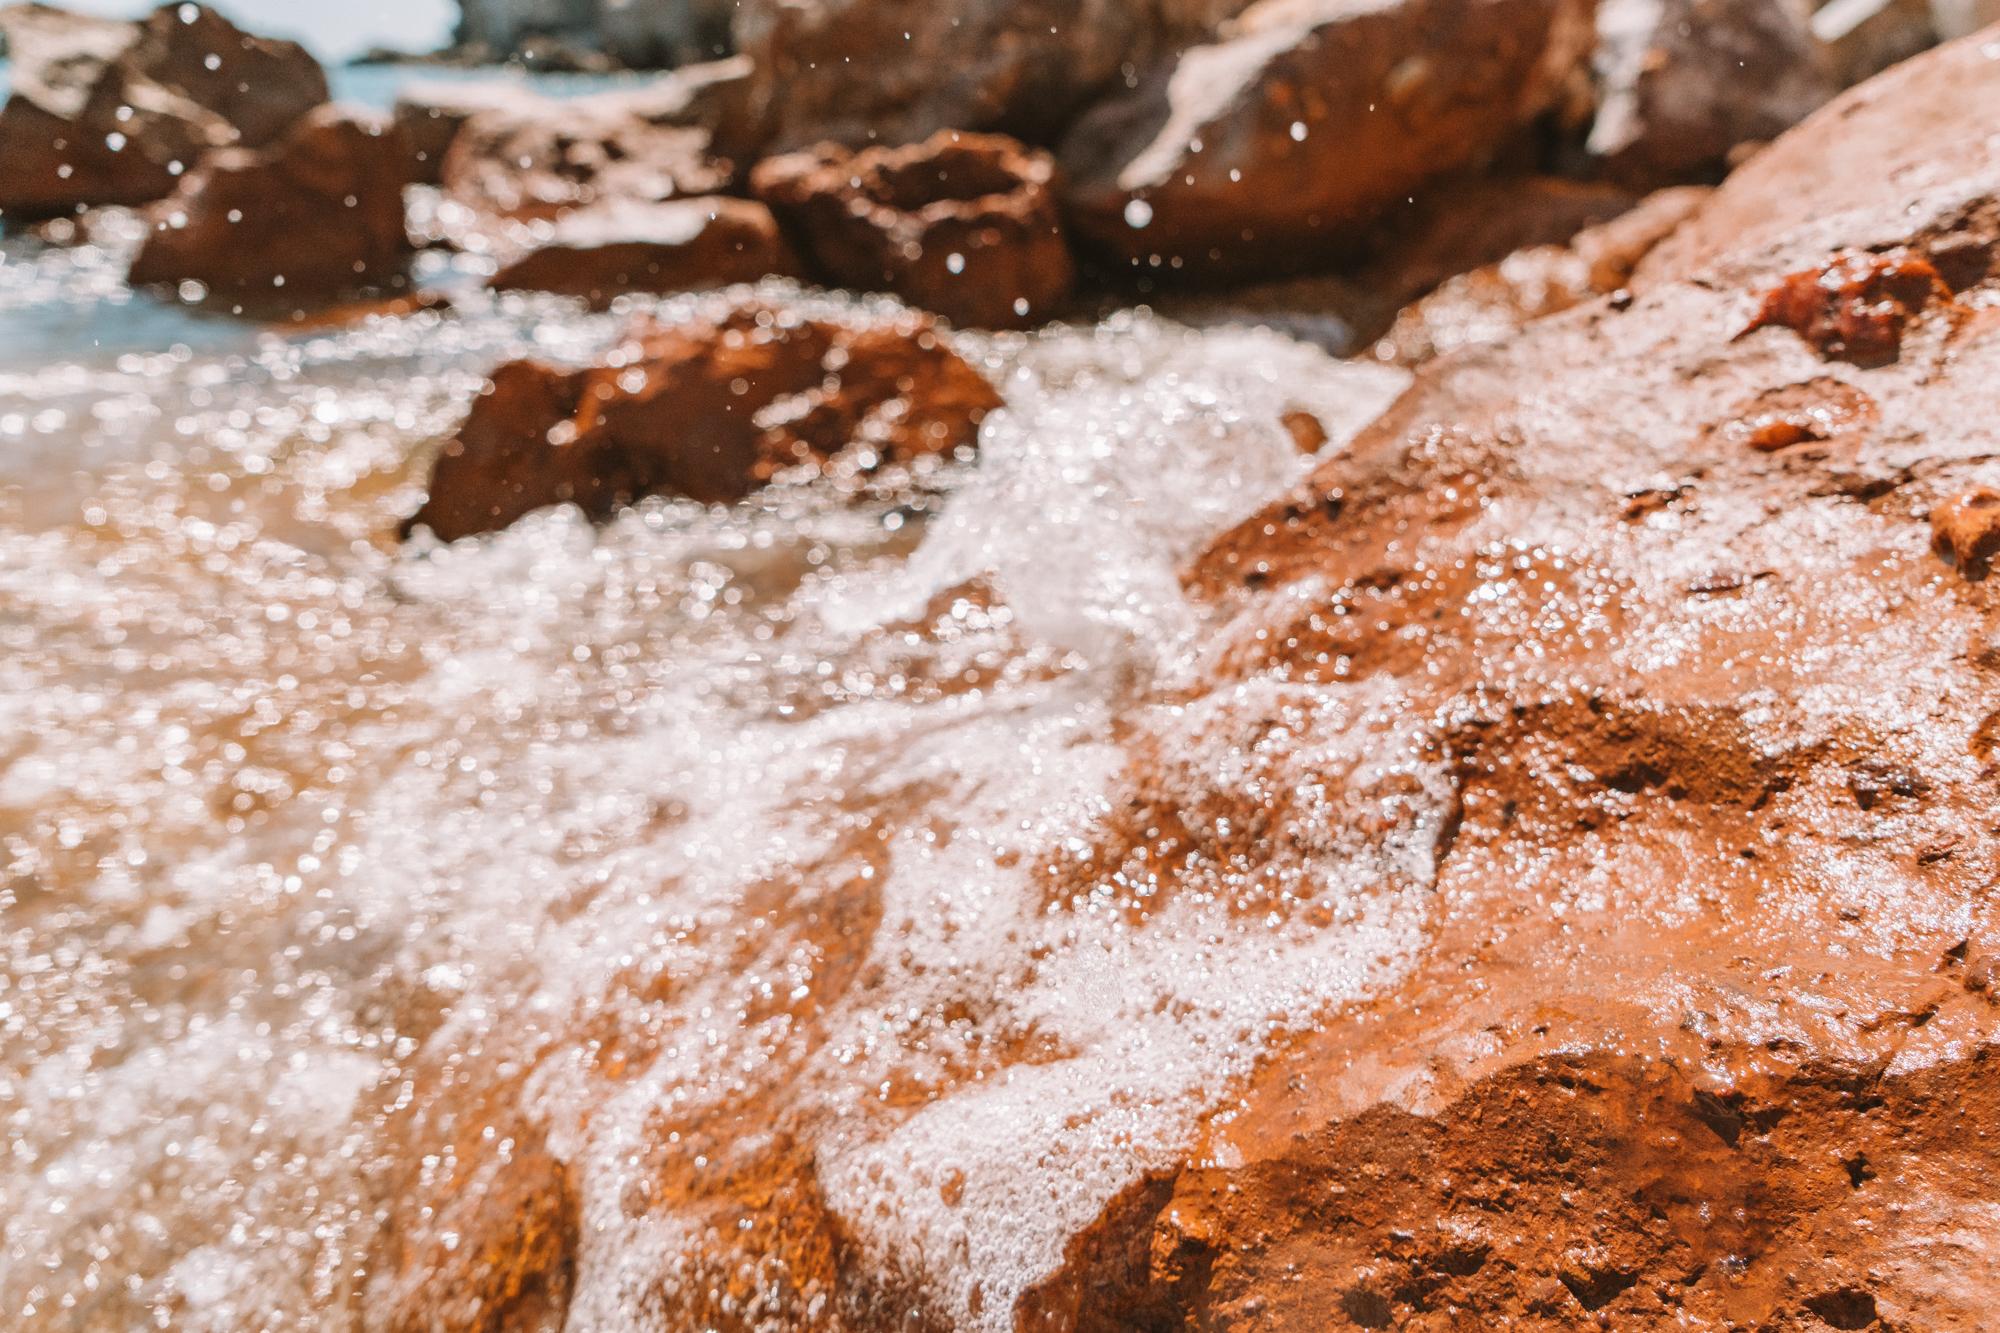 Rock details close-up at Paleochori Beach, Milos Greece